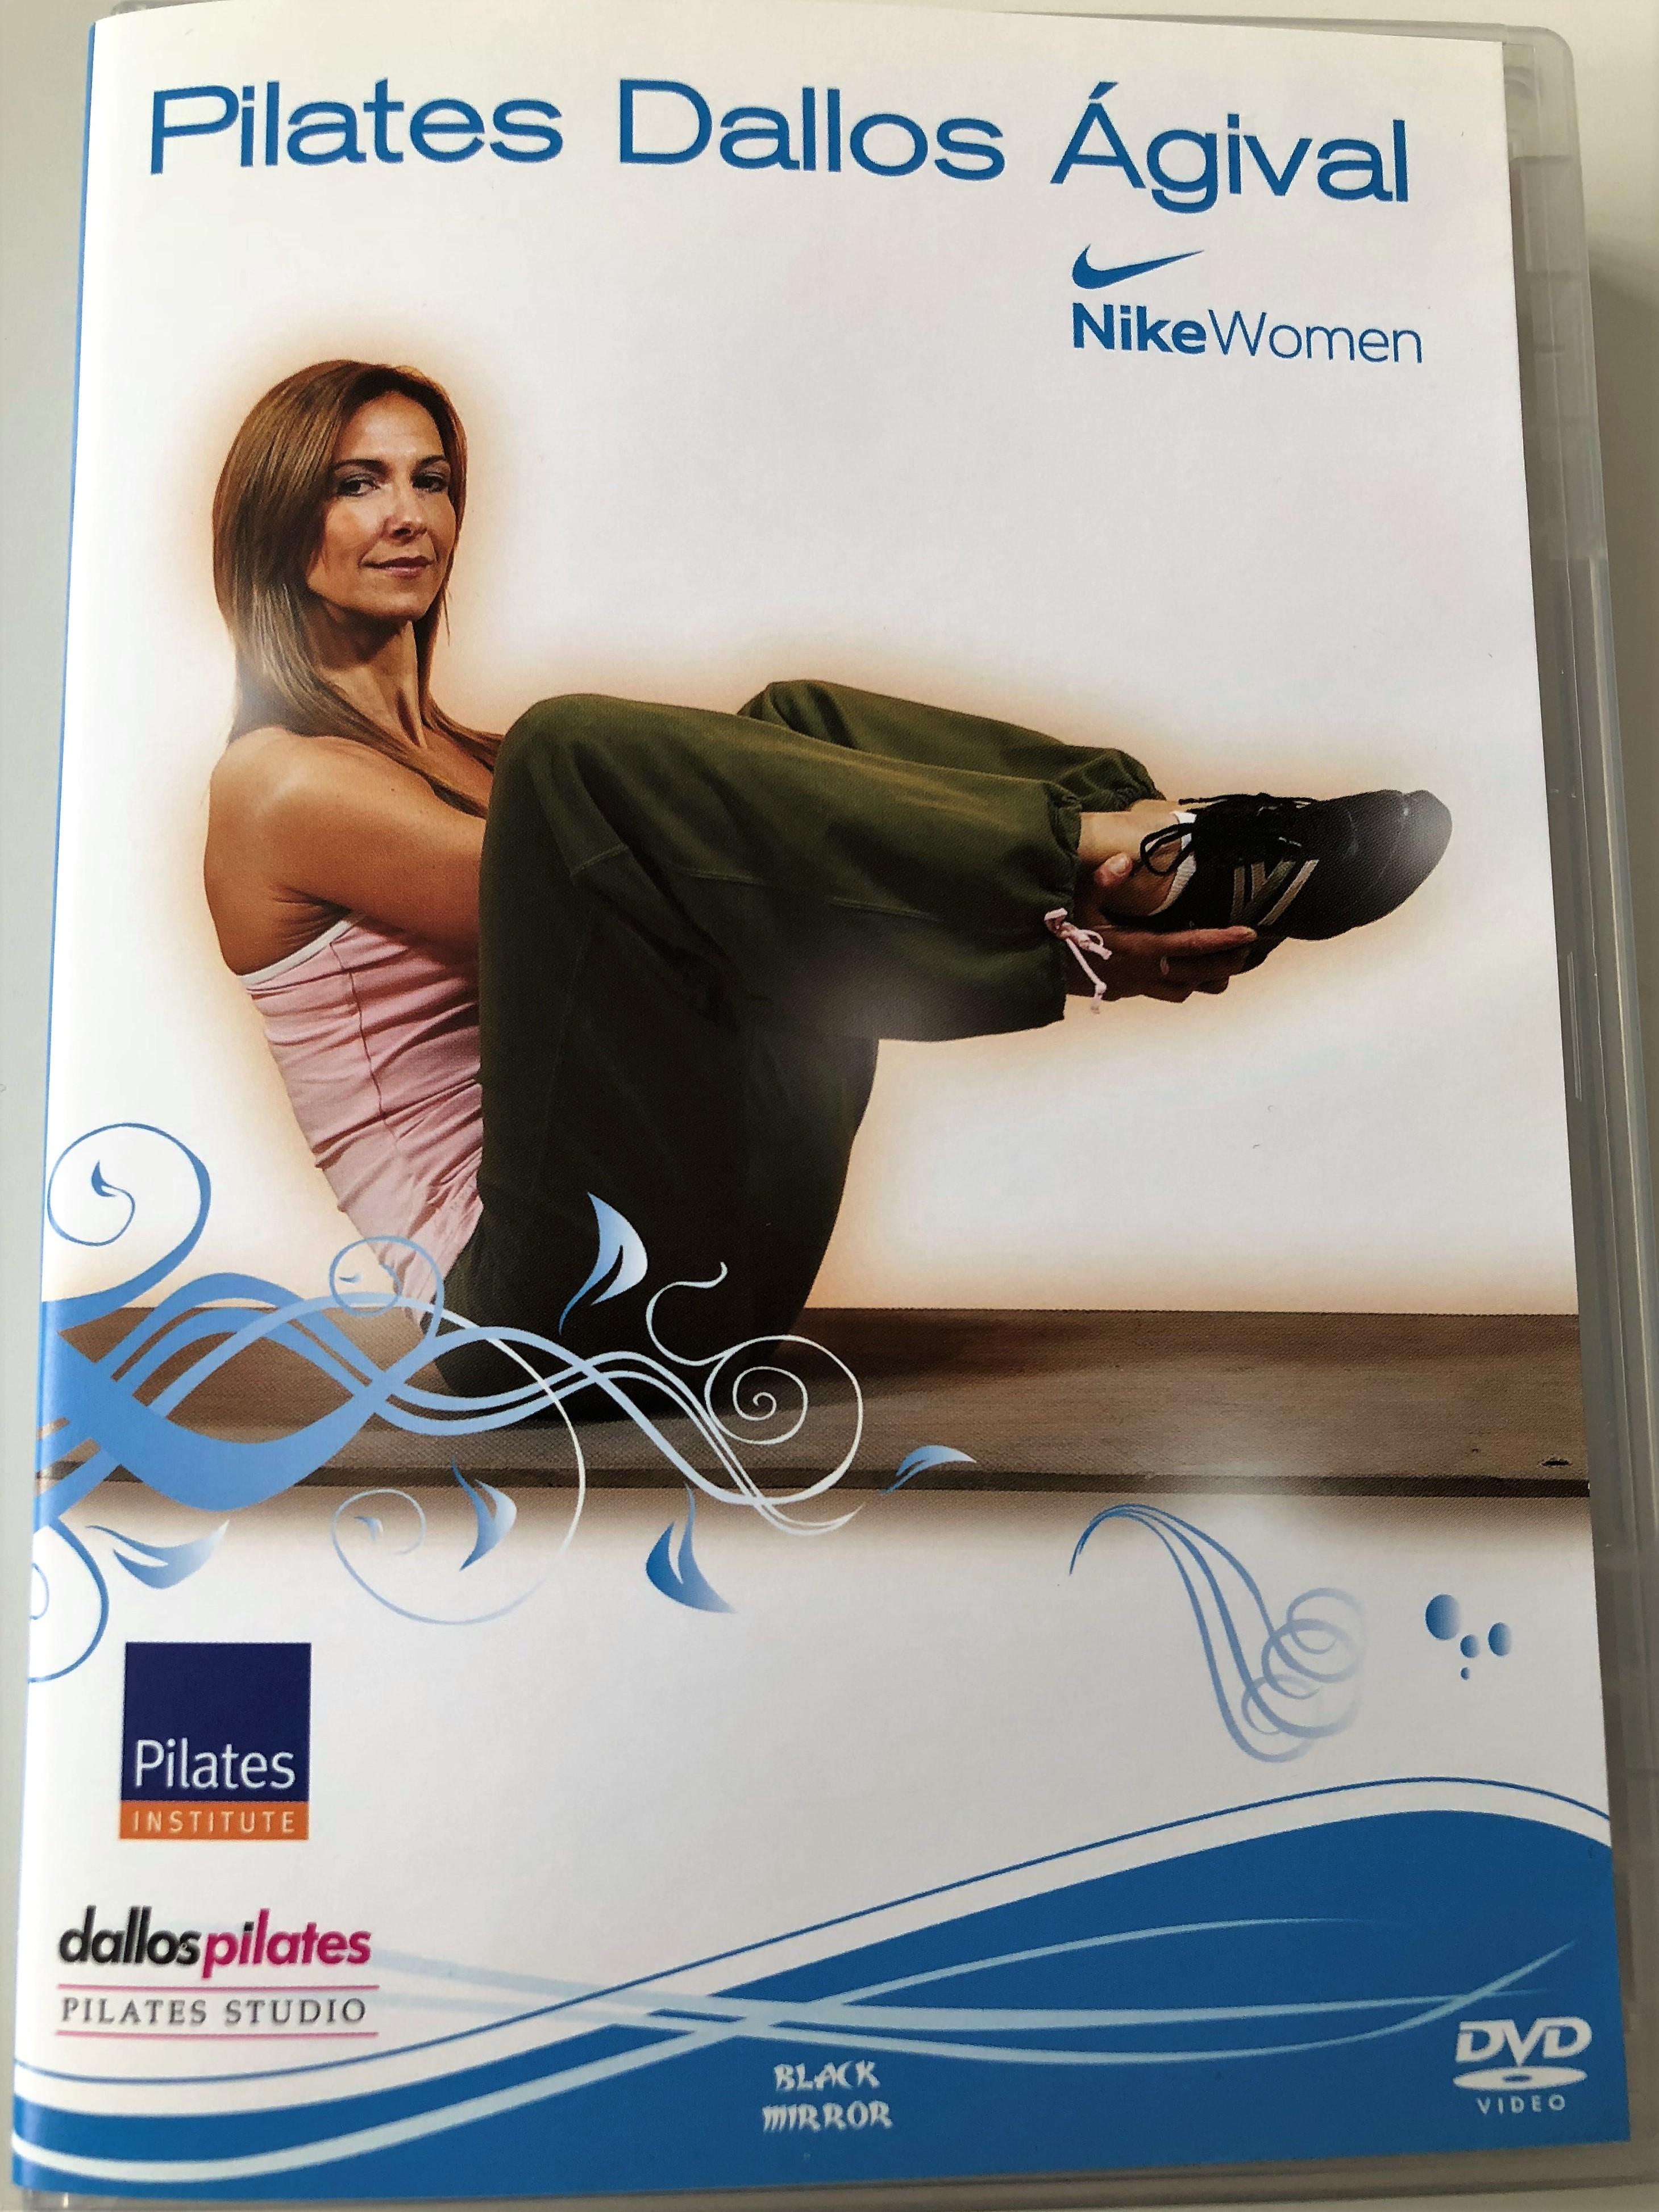 pilates-dallos-gival-dvd-2007-directed-by-dallos-gi-nike-women-pilates-institute-1-.jpg